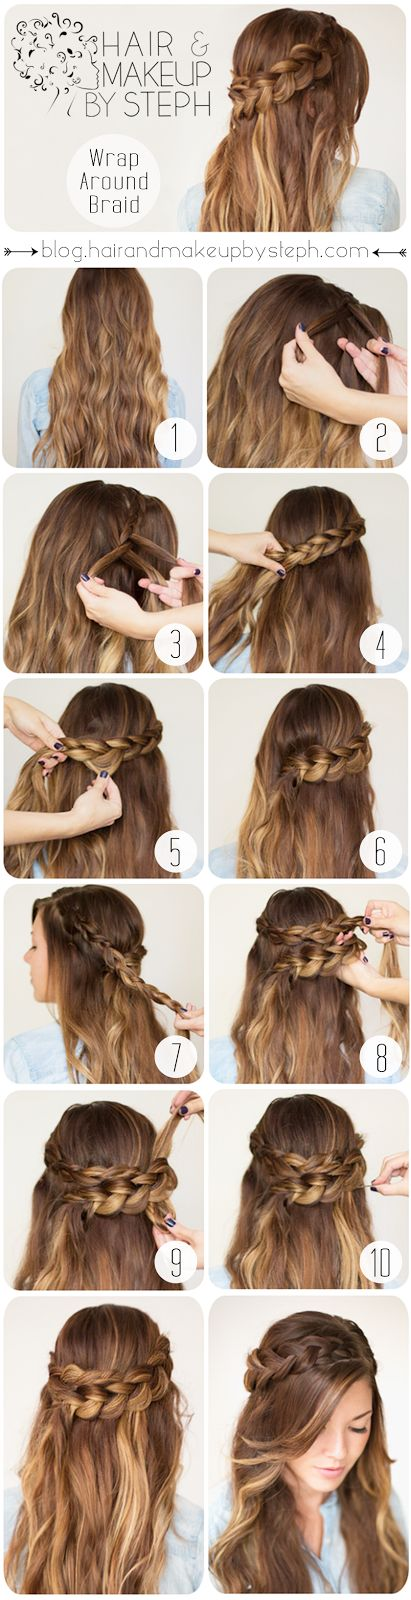 http://blog.hairandmakeupbysteph.com/p/step-by-steps.html?m=1